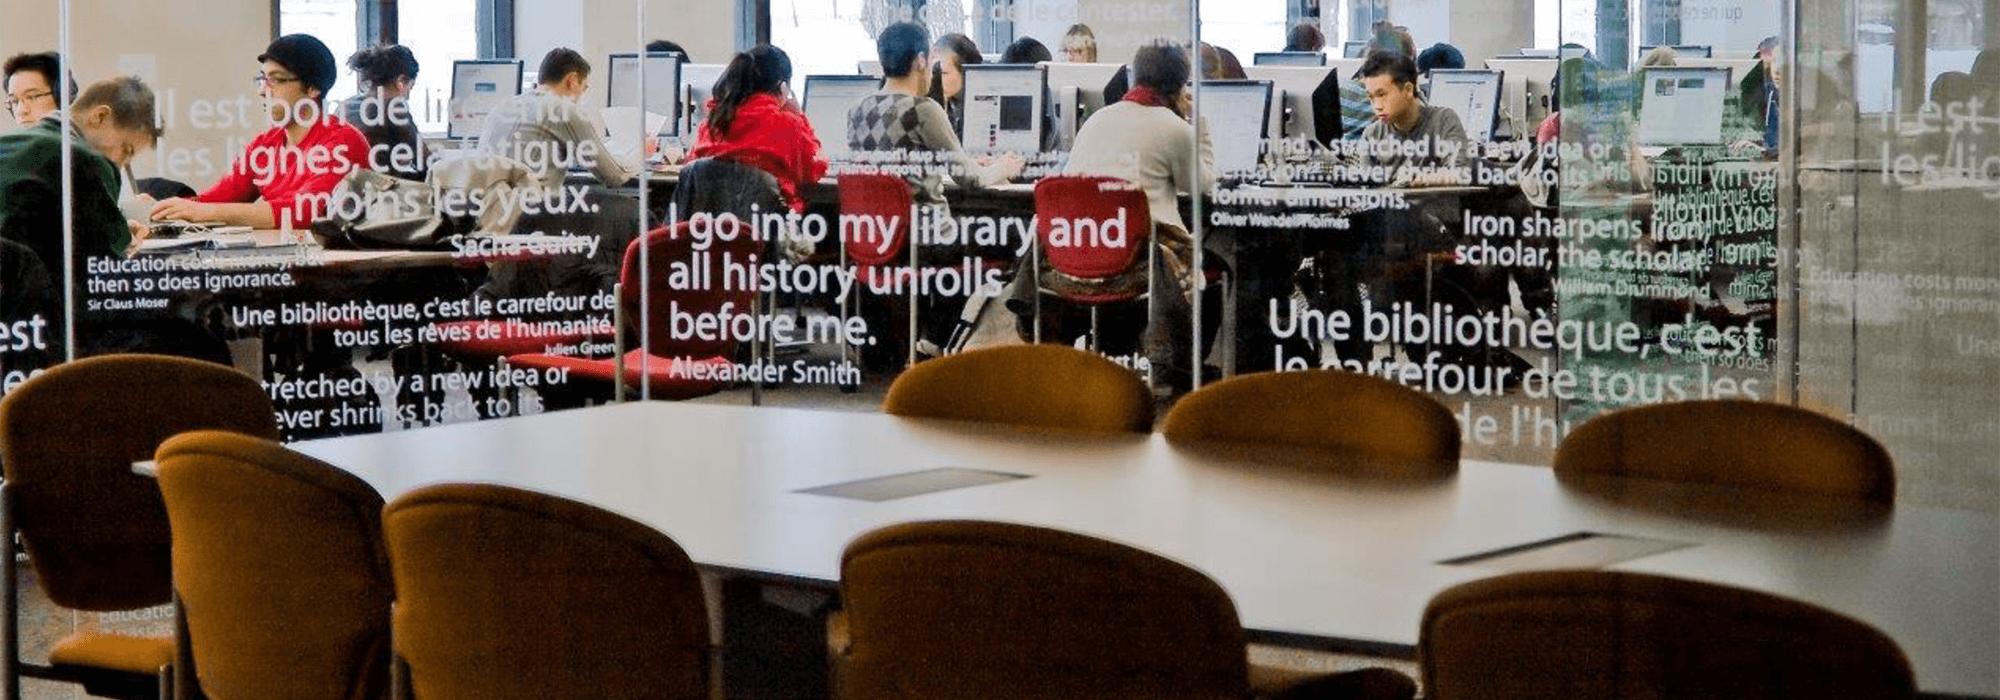 McGill University McLennan-Redpath Library Cybertheque interior